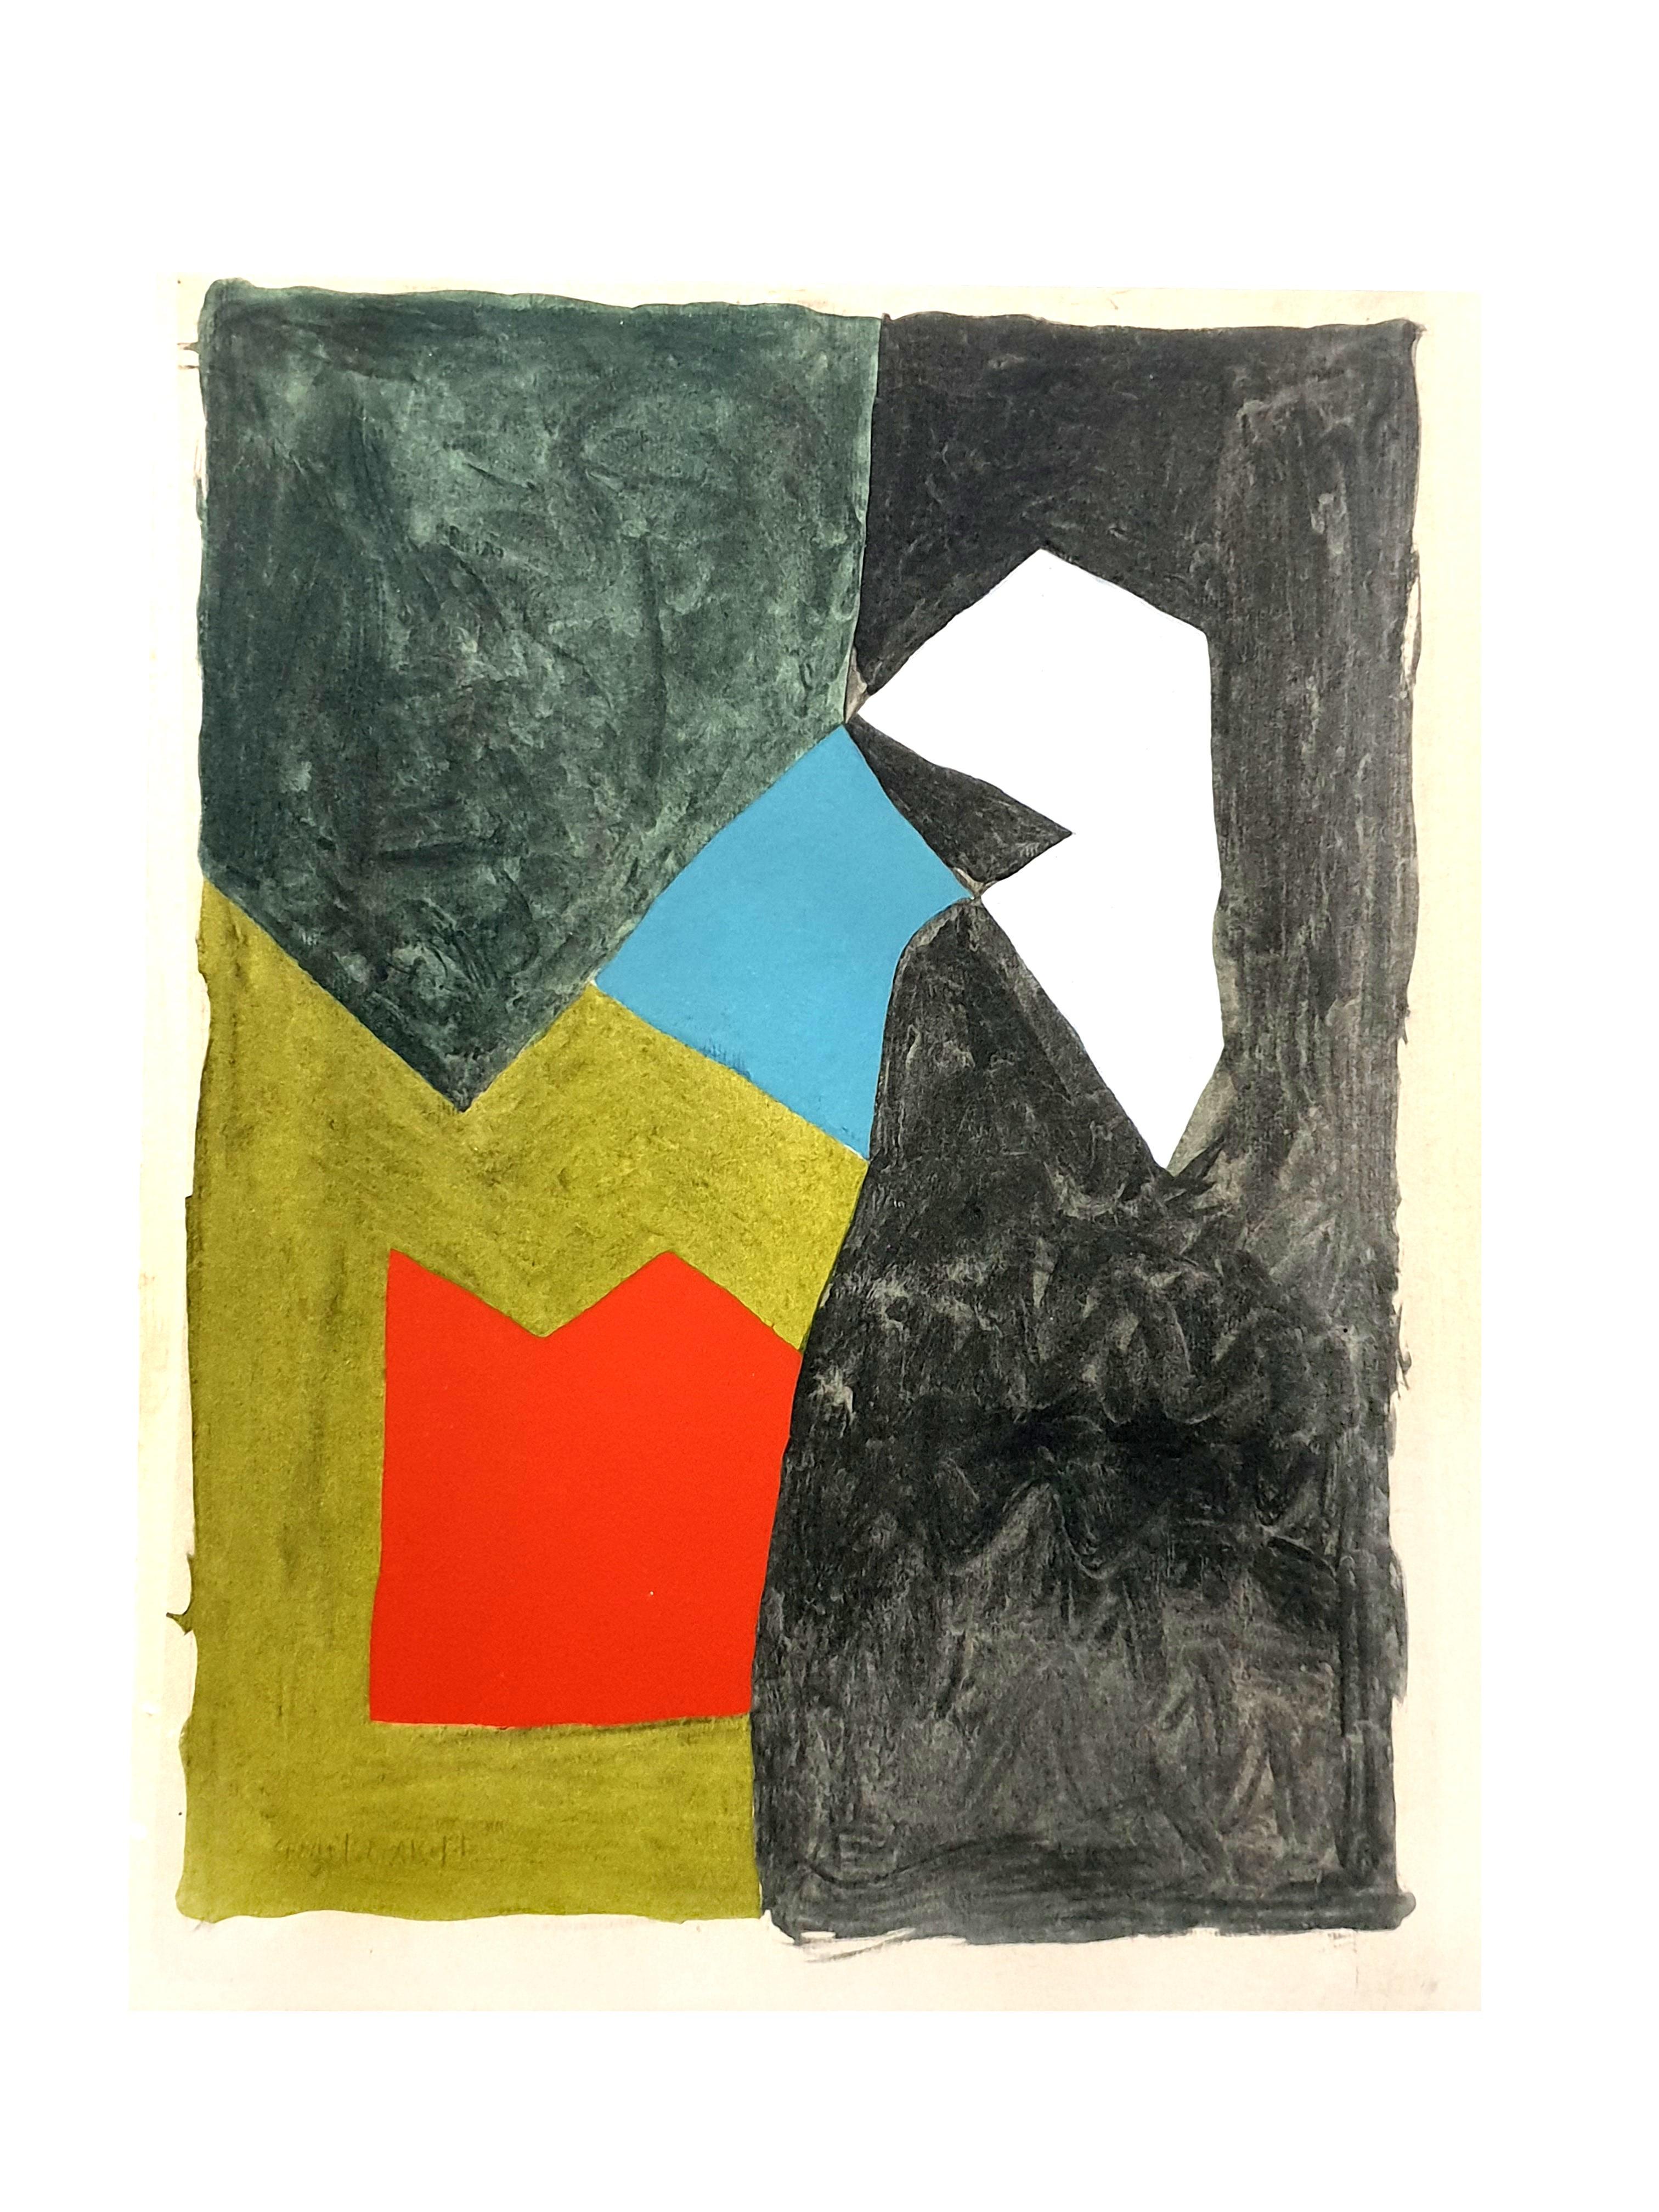 Serge Poliakoff (after) - Composition - Pochoir